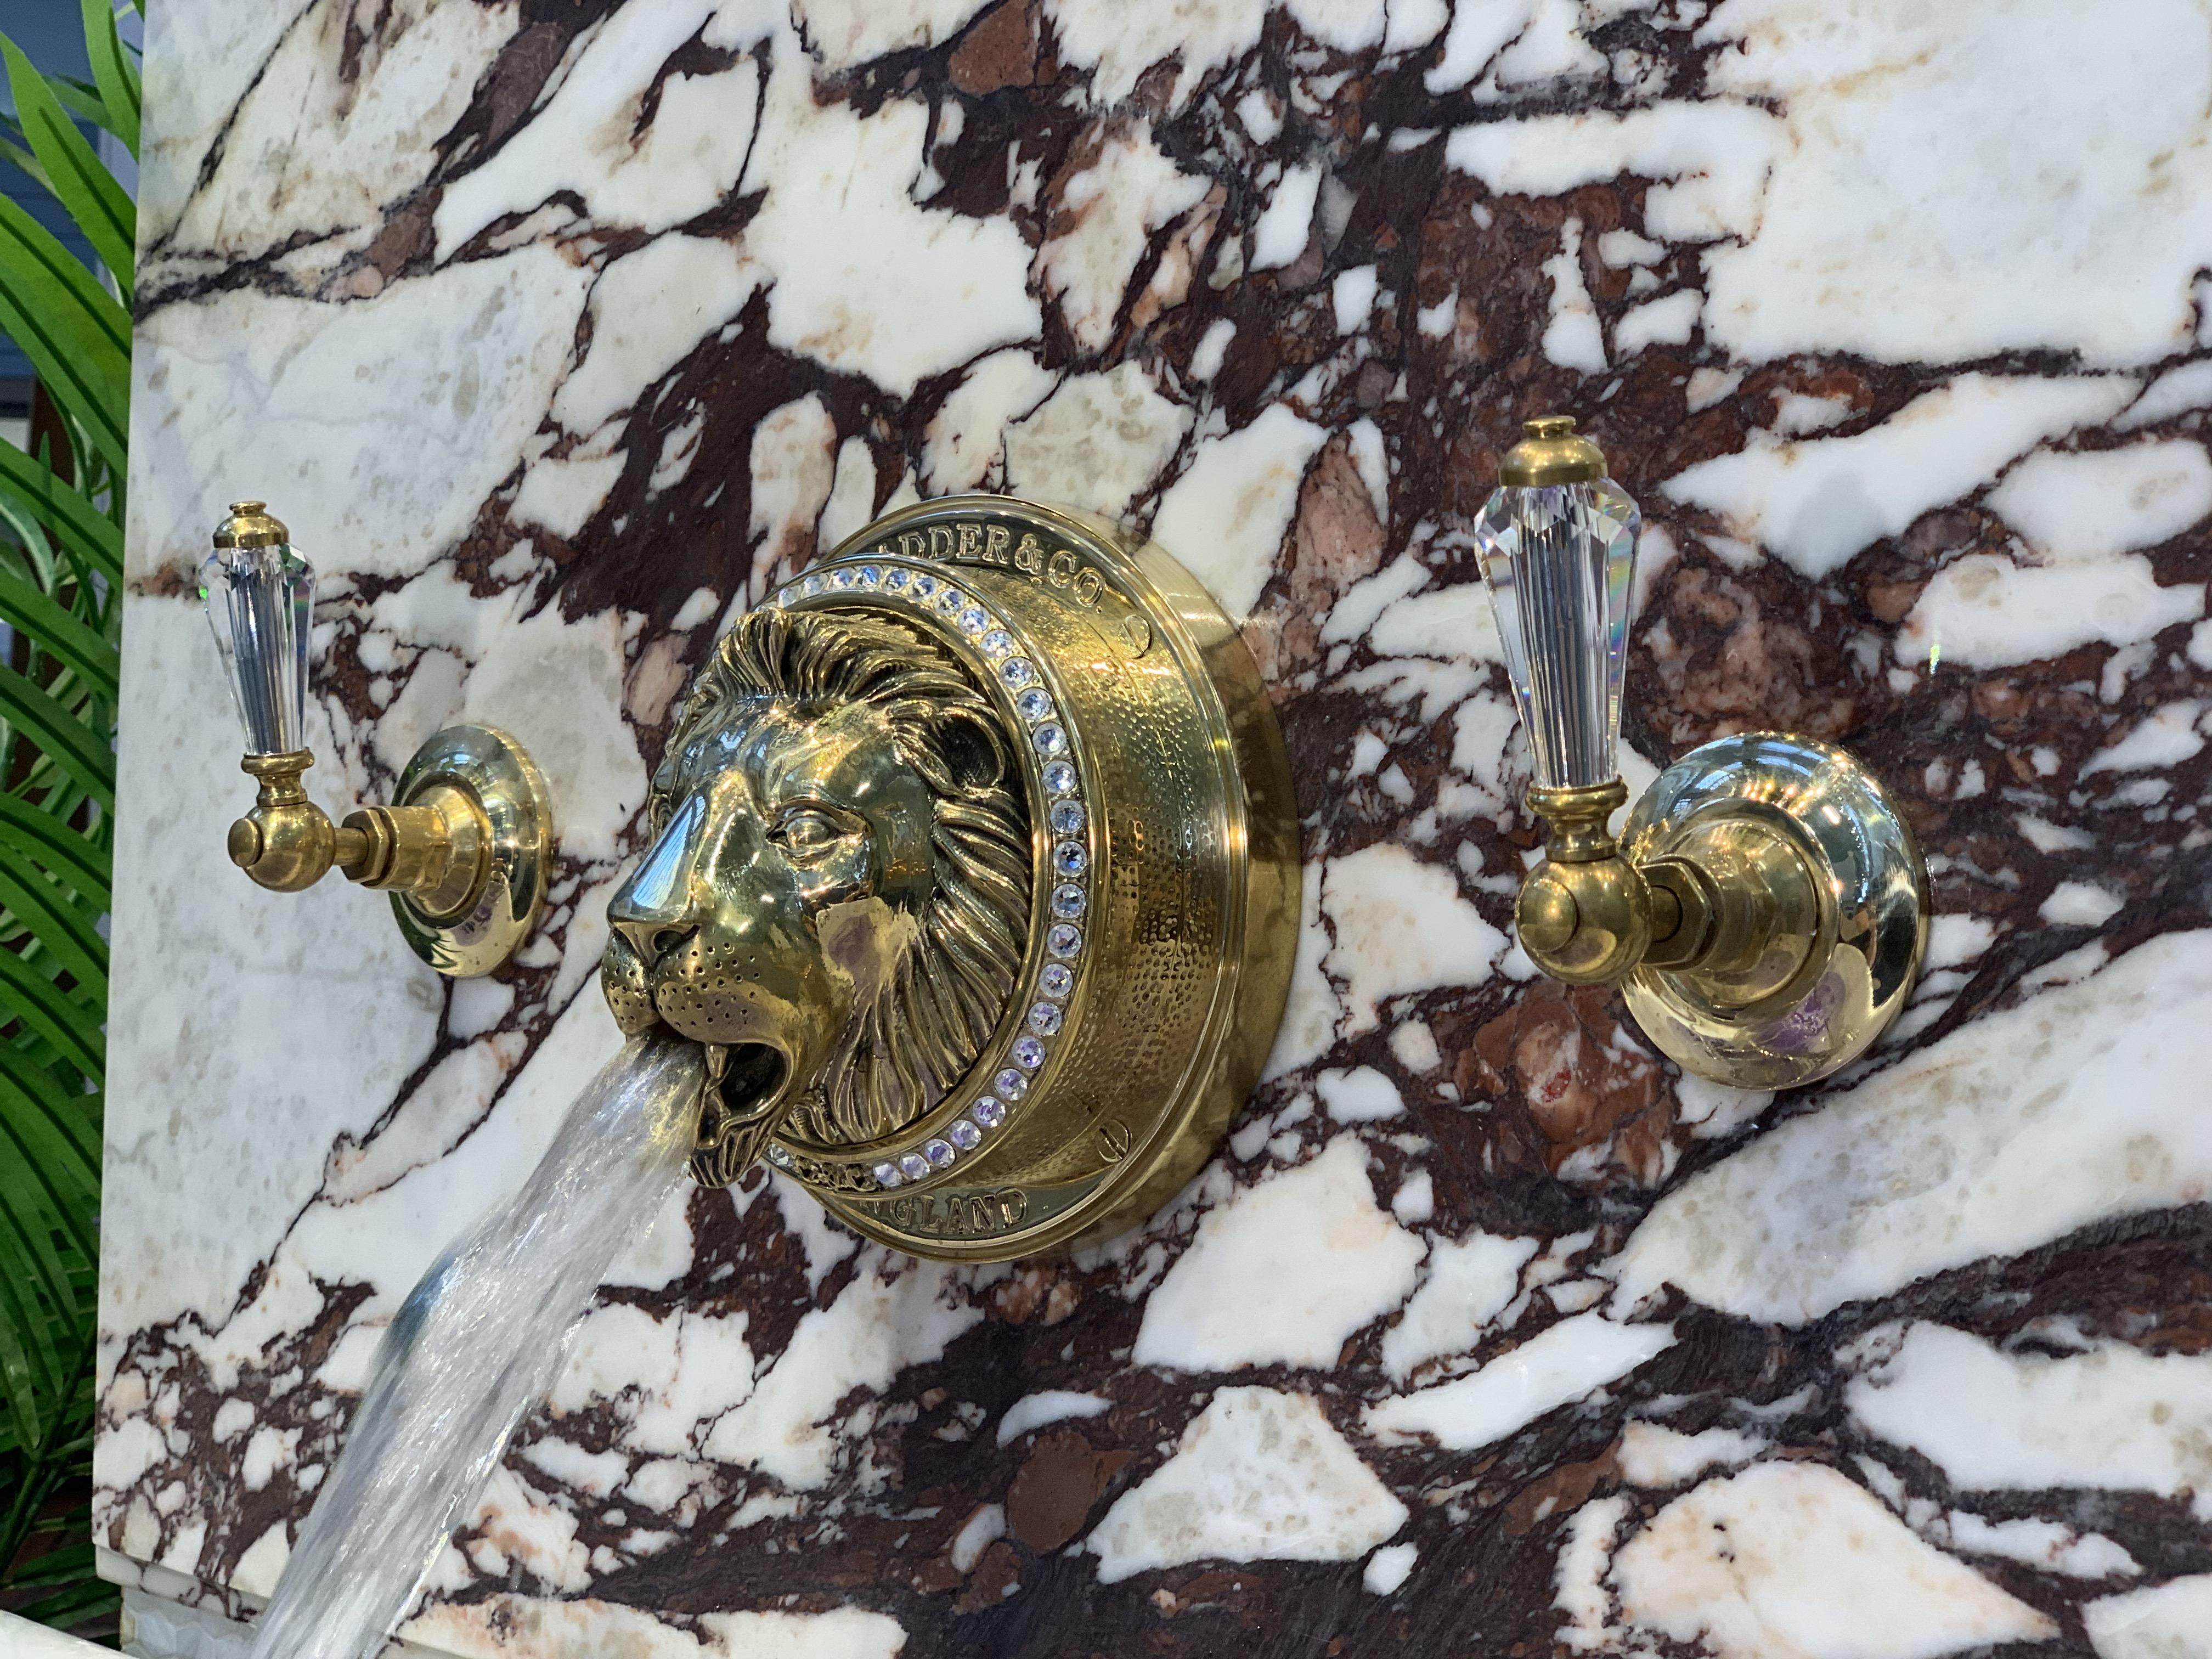 lionshead bath filler tap faucet Swarovski crystal bathroom